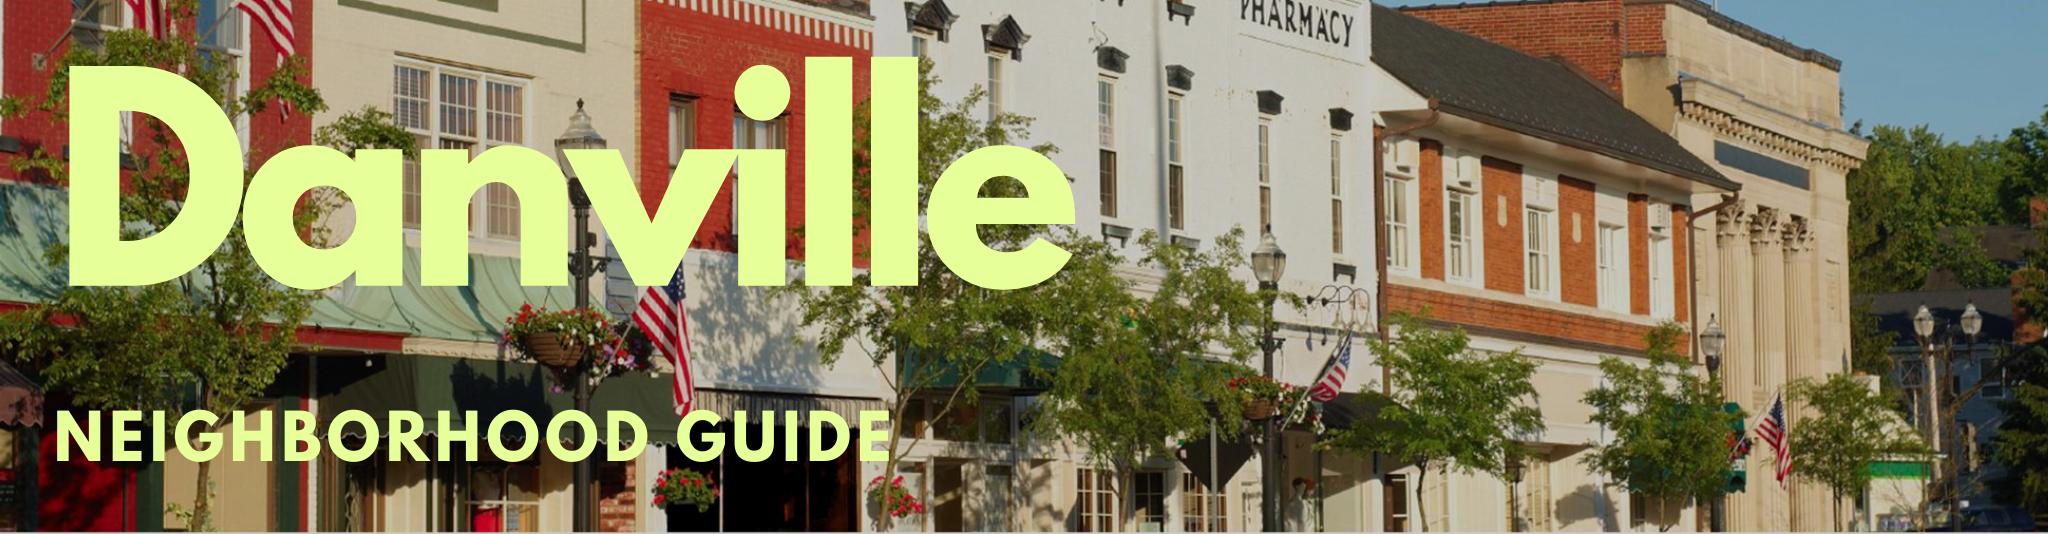 danville indiana real estate neighborhood guide